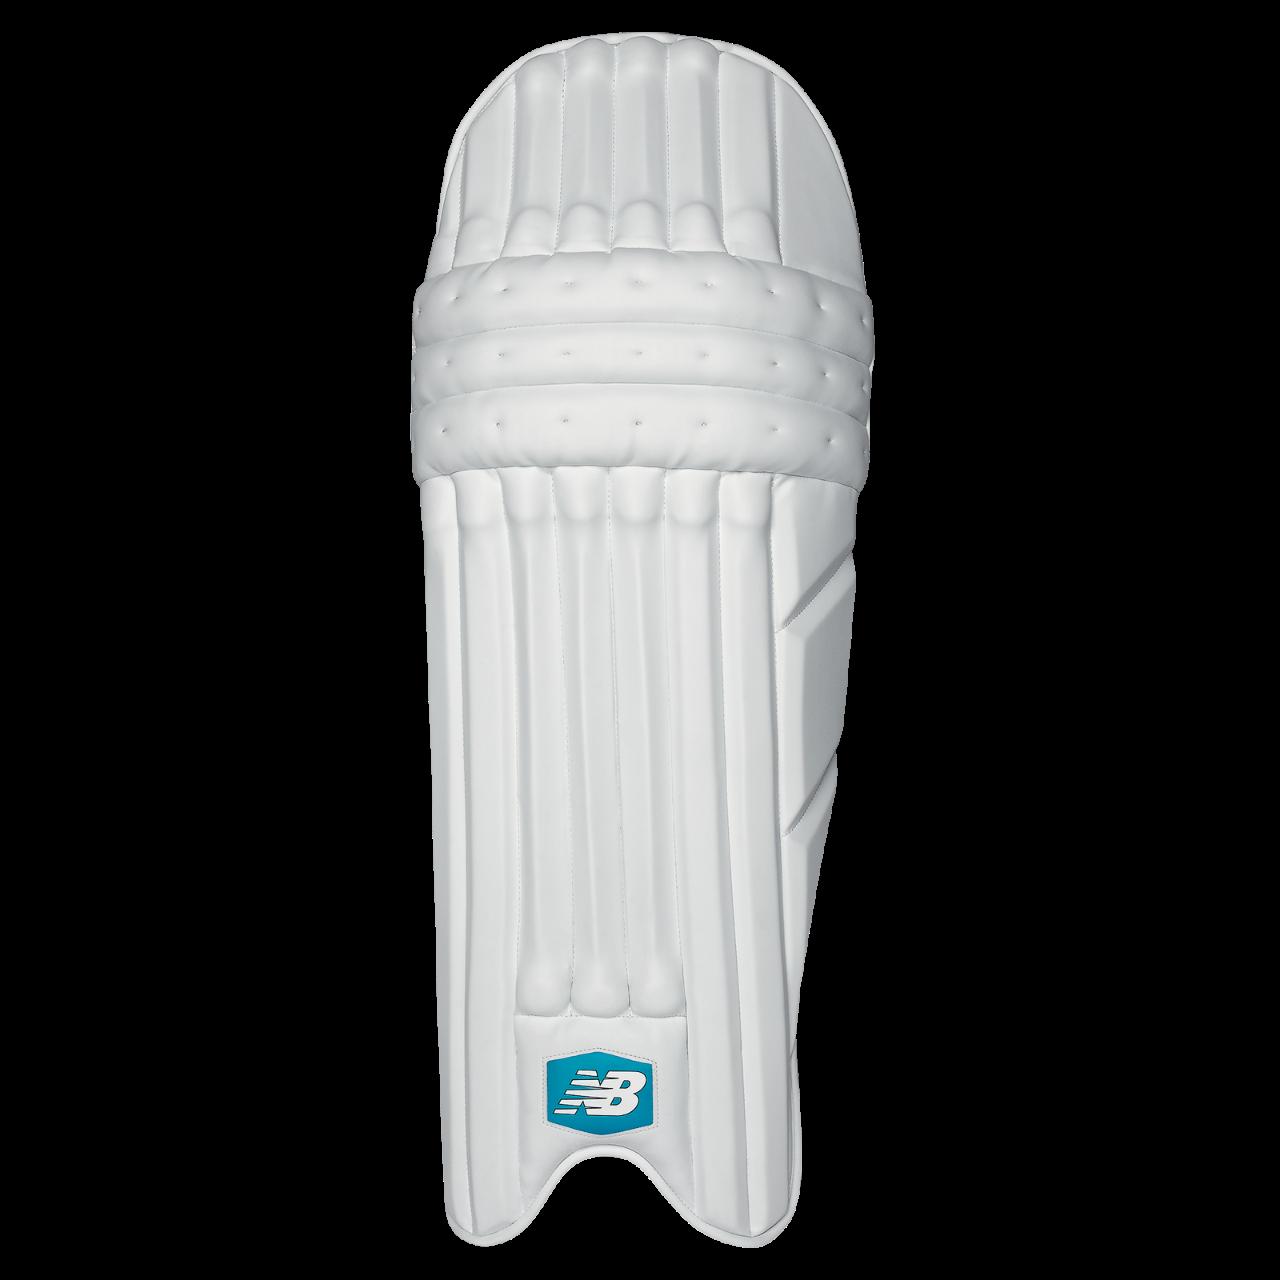 2020 New Balance DC 1080 Batting Pads